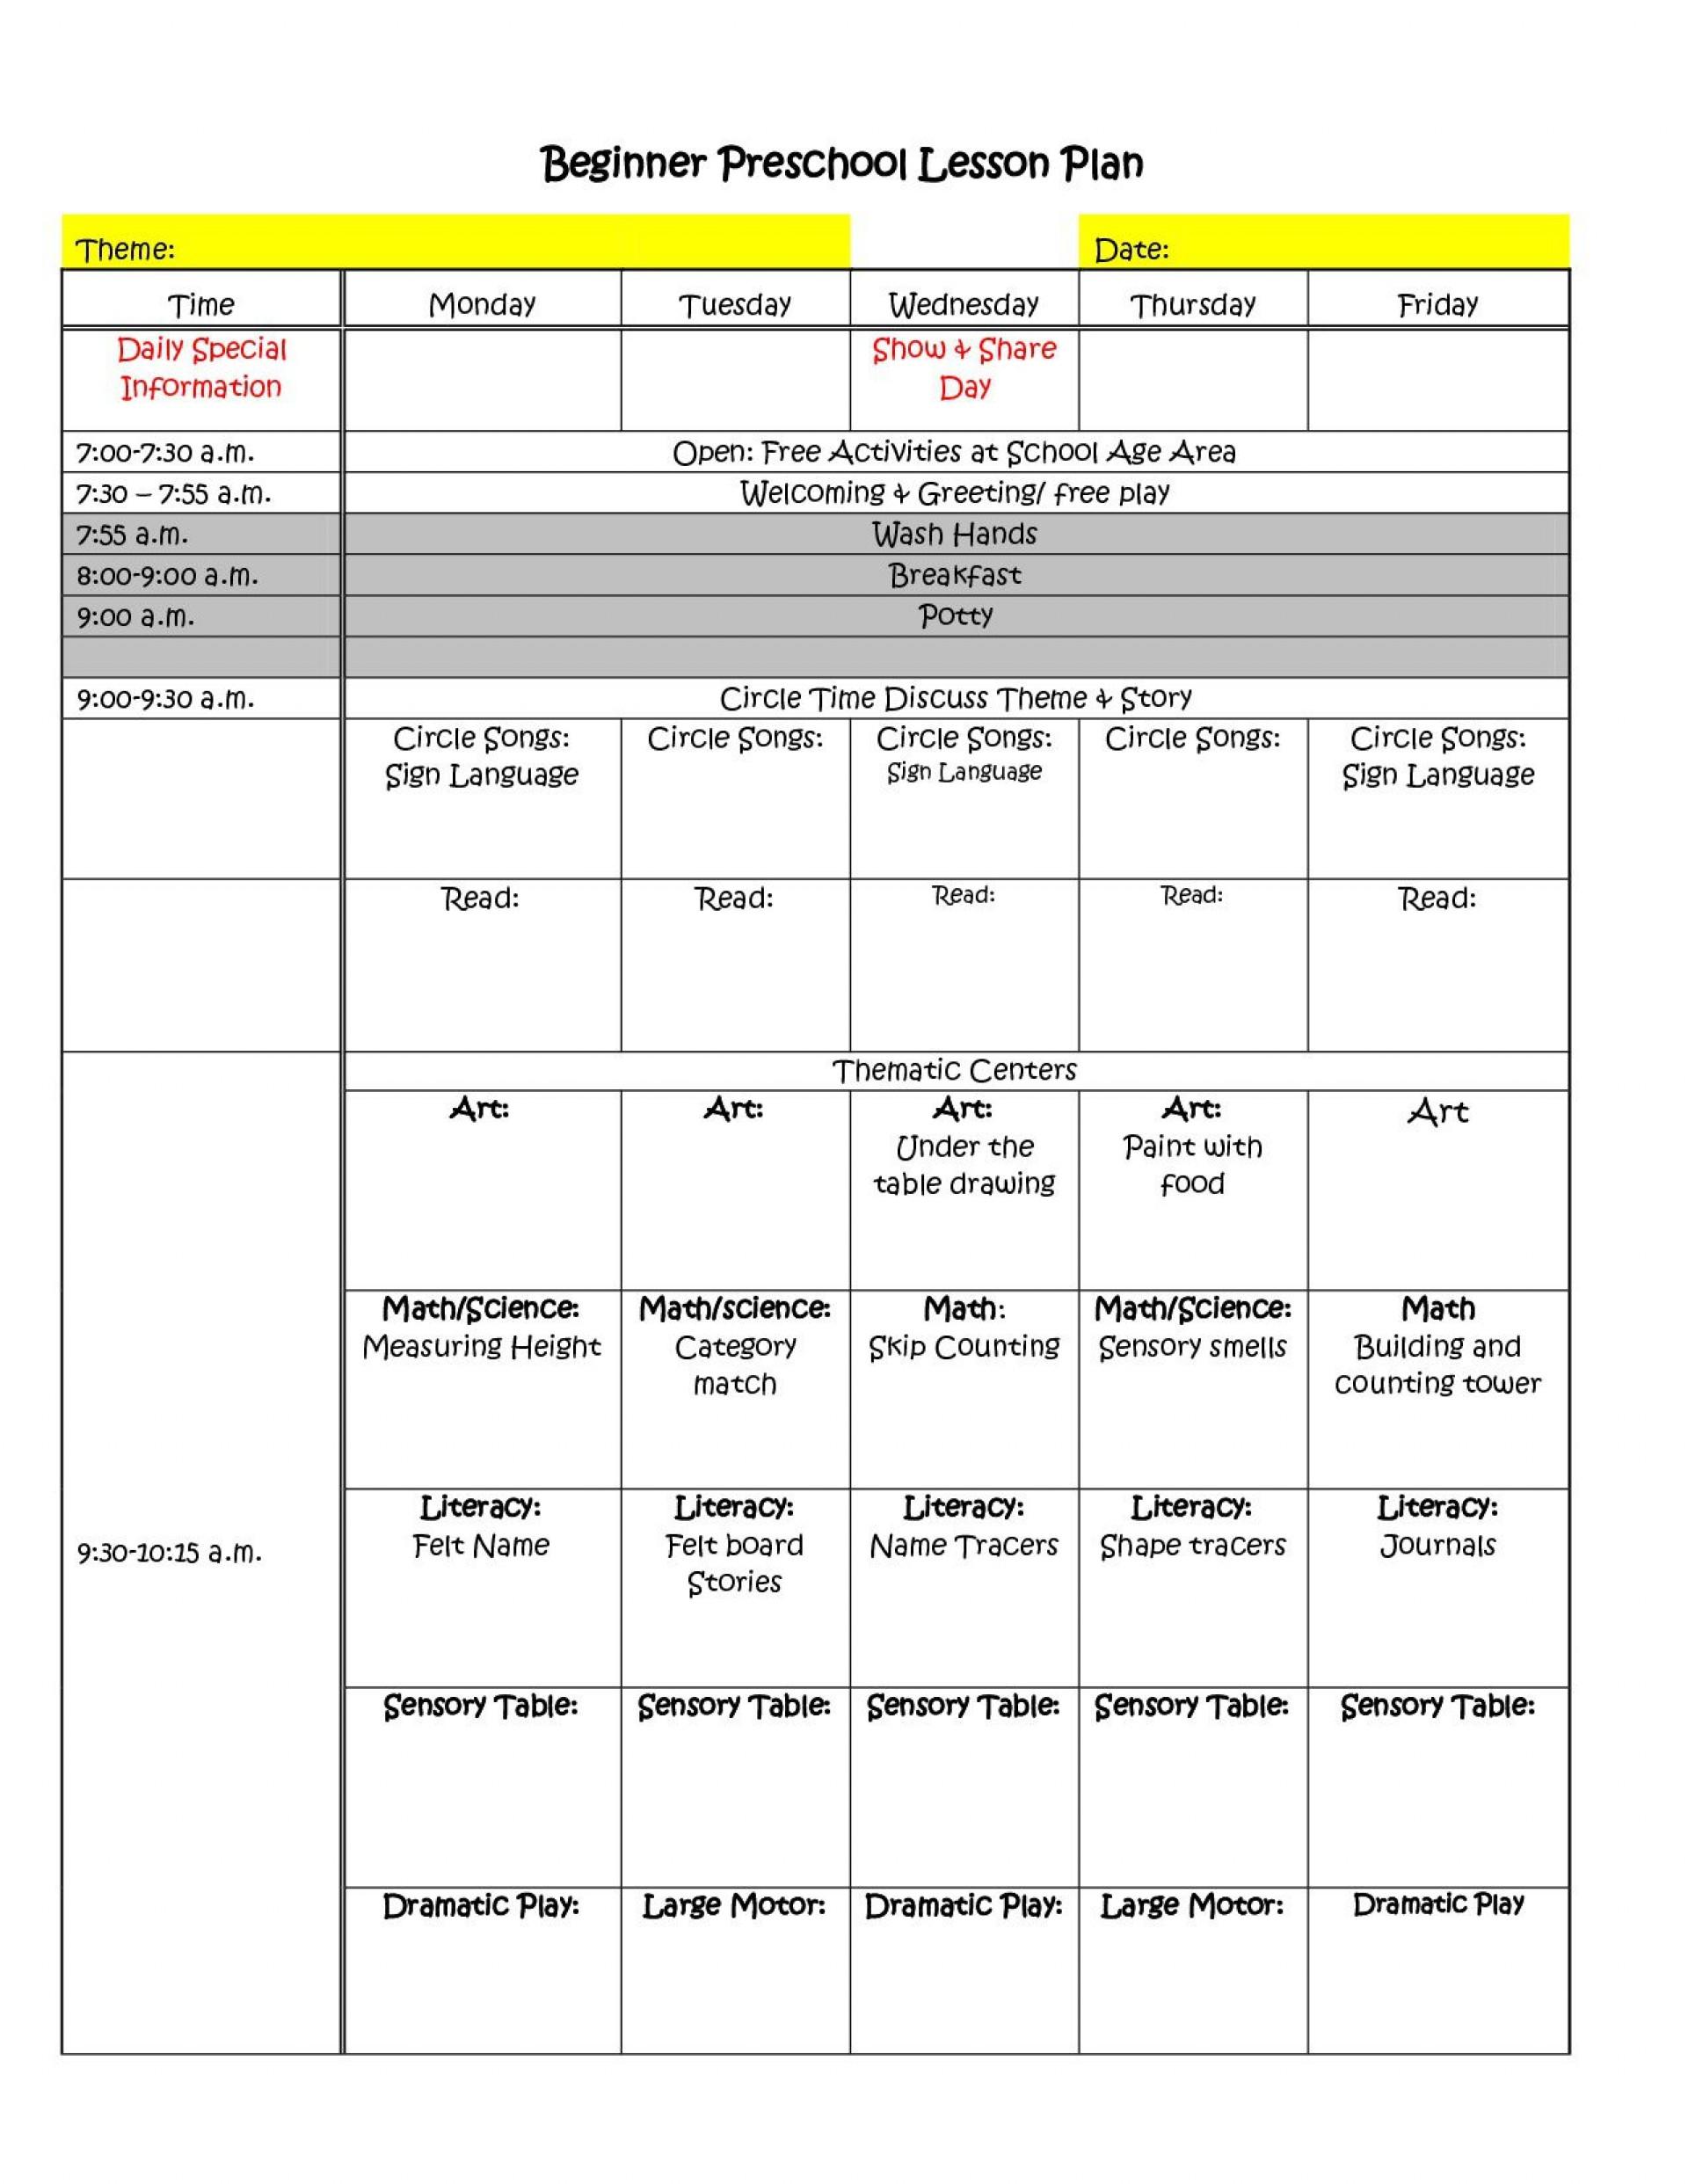 002 Unusual Prek Lesson Plan Template Sample  Free Daycare Pdf Example Of Pre-k1920